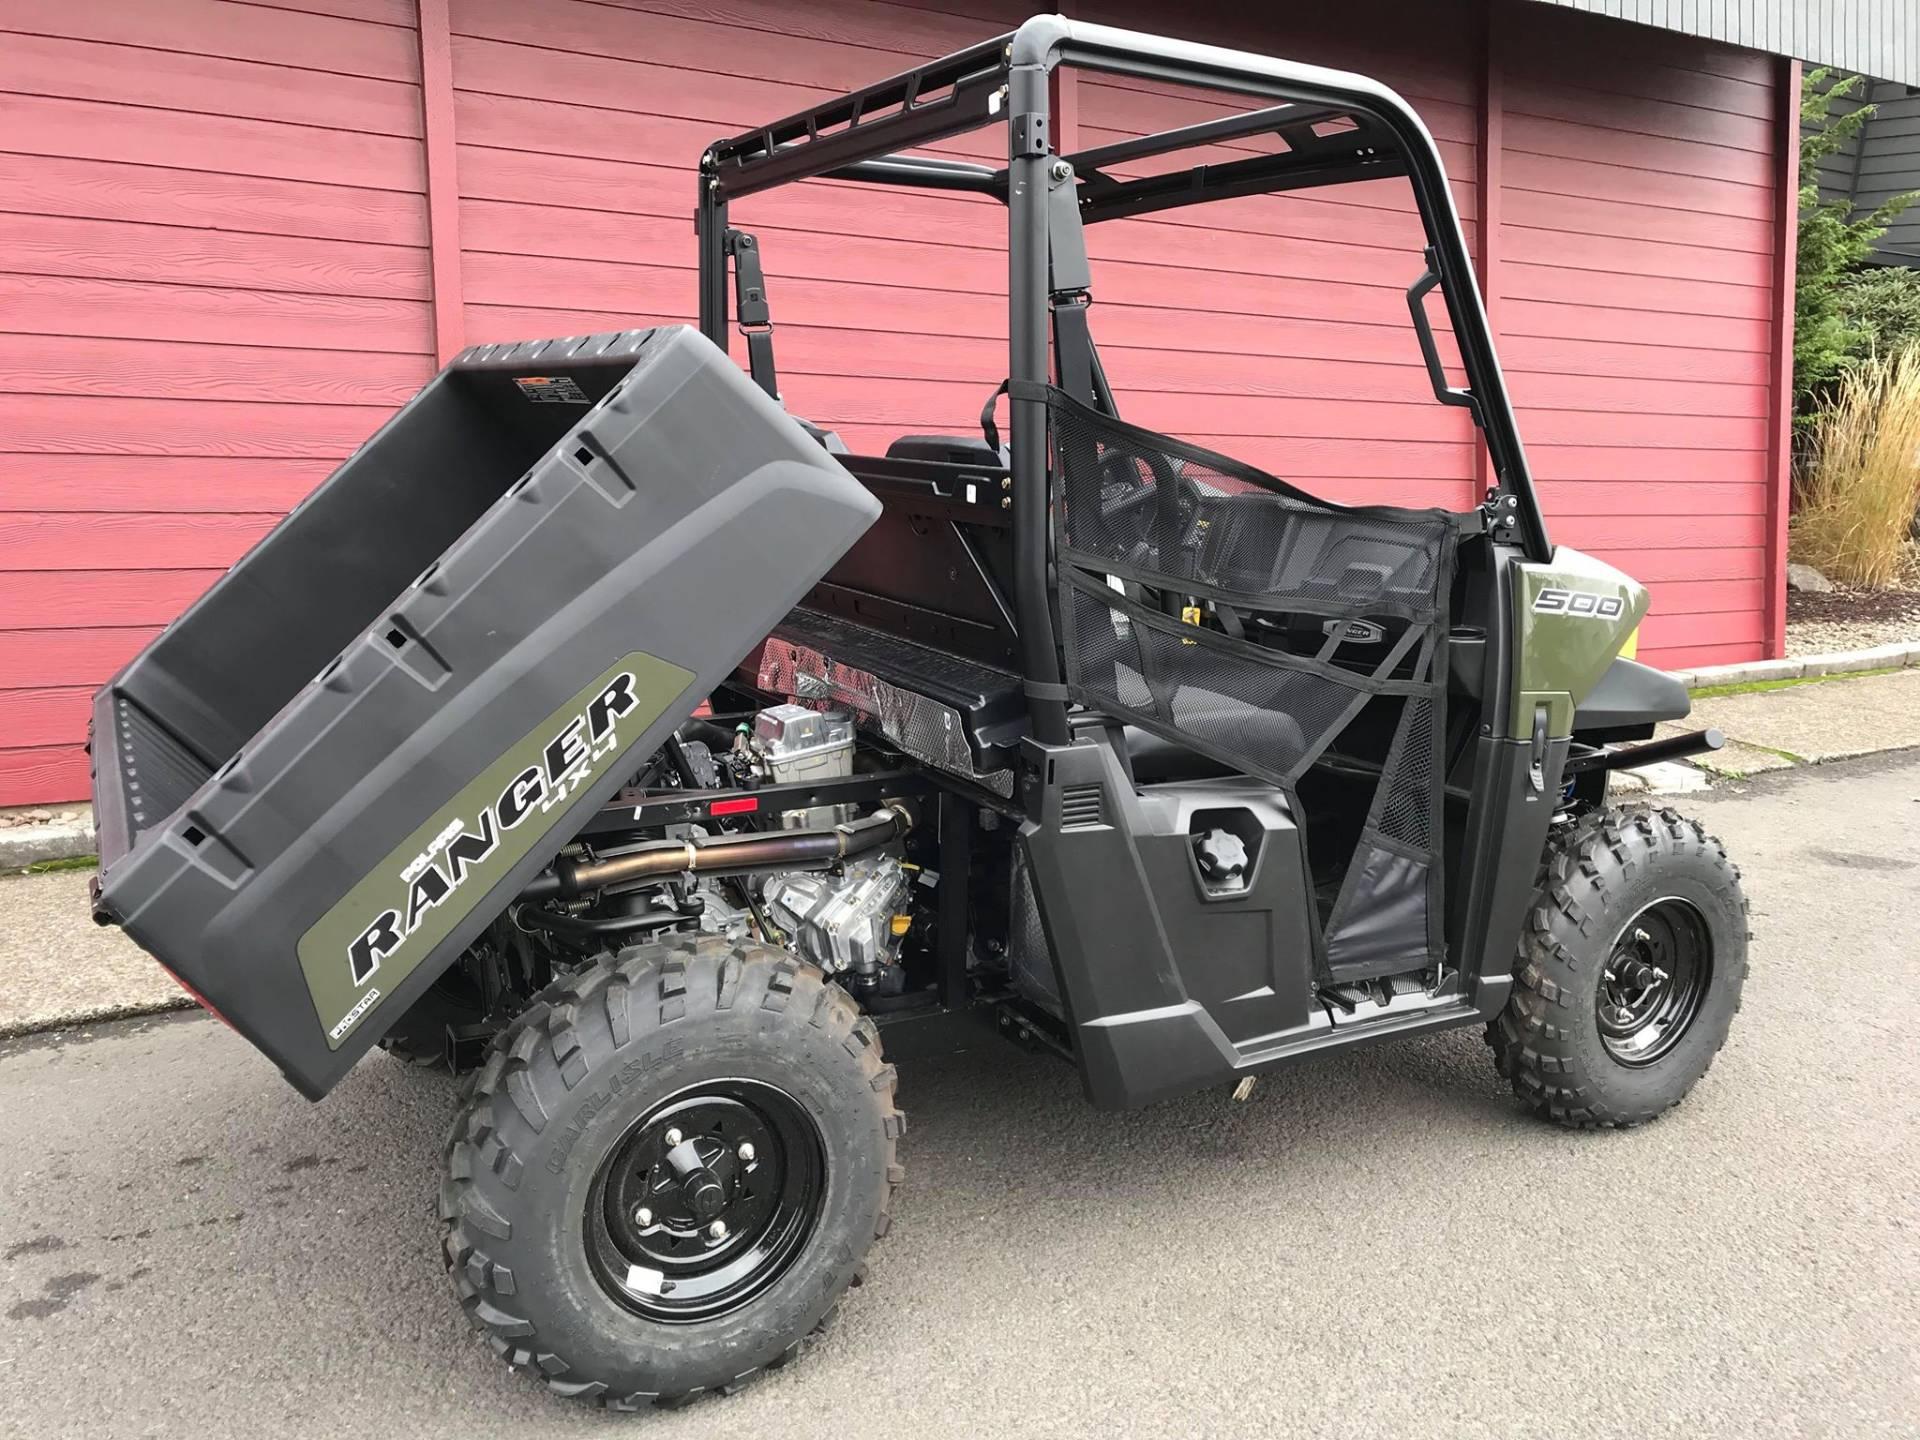 2019 Polaris Ranger 500 for sale 57803